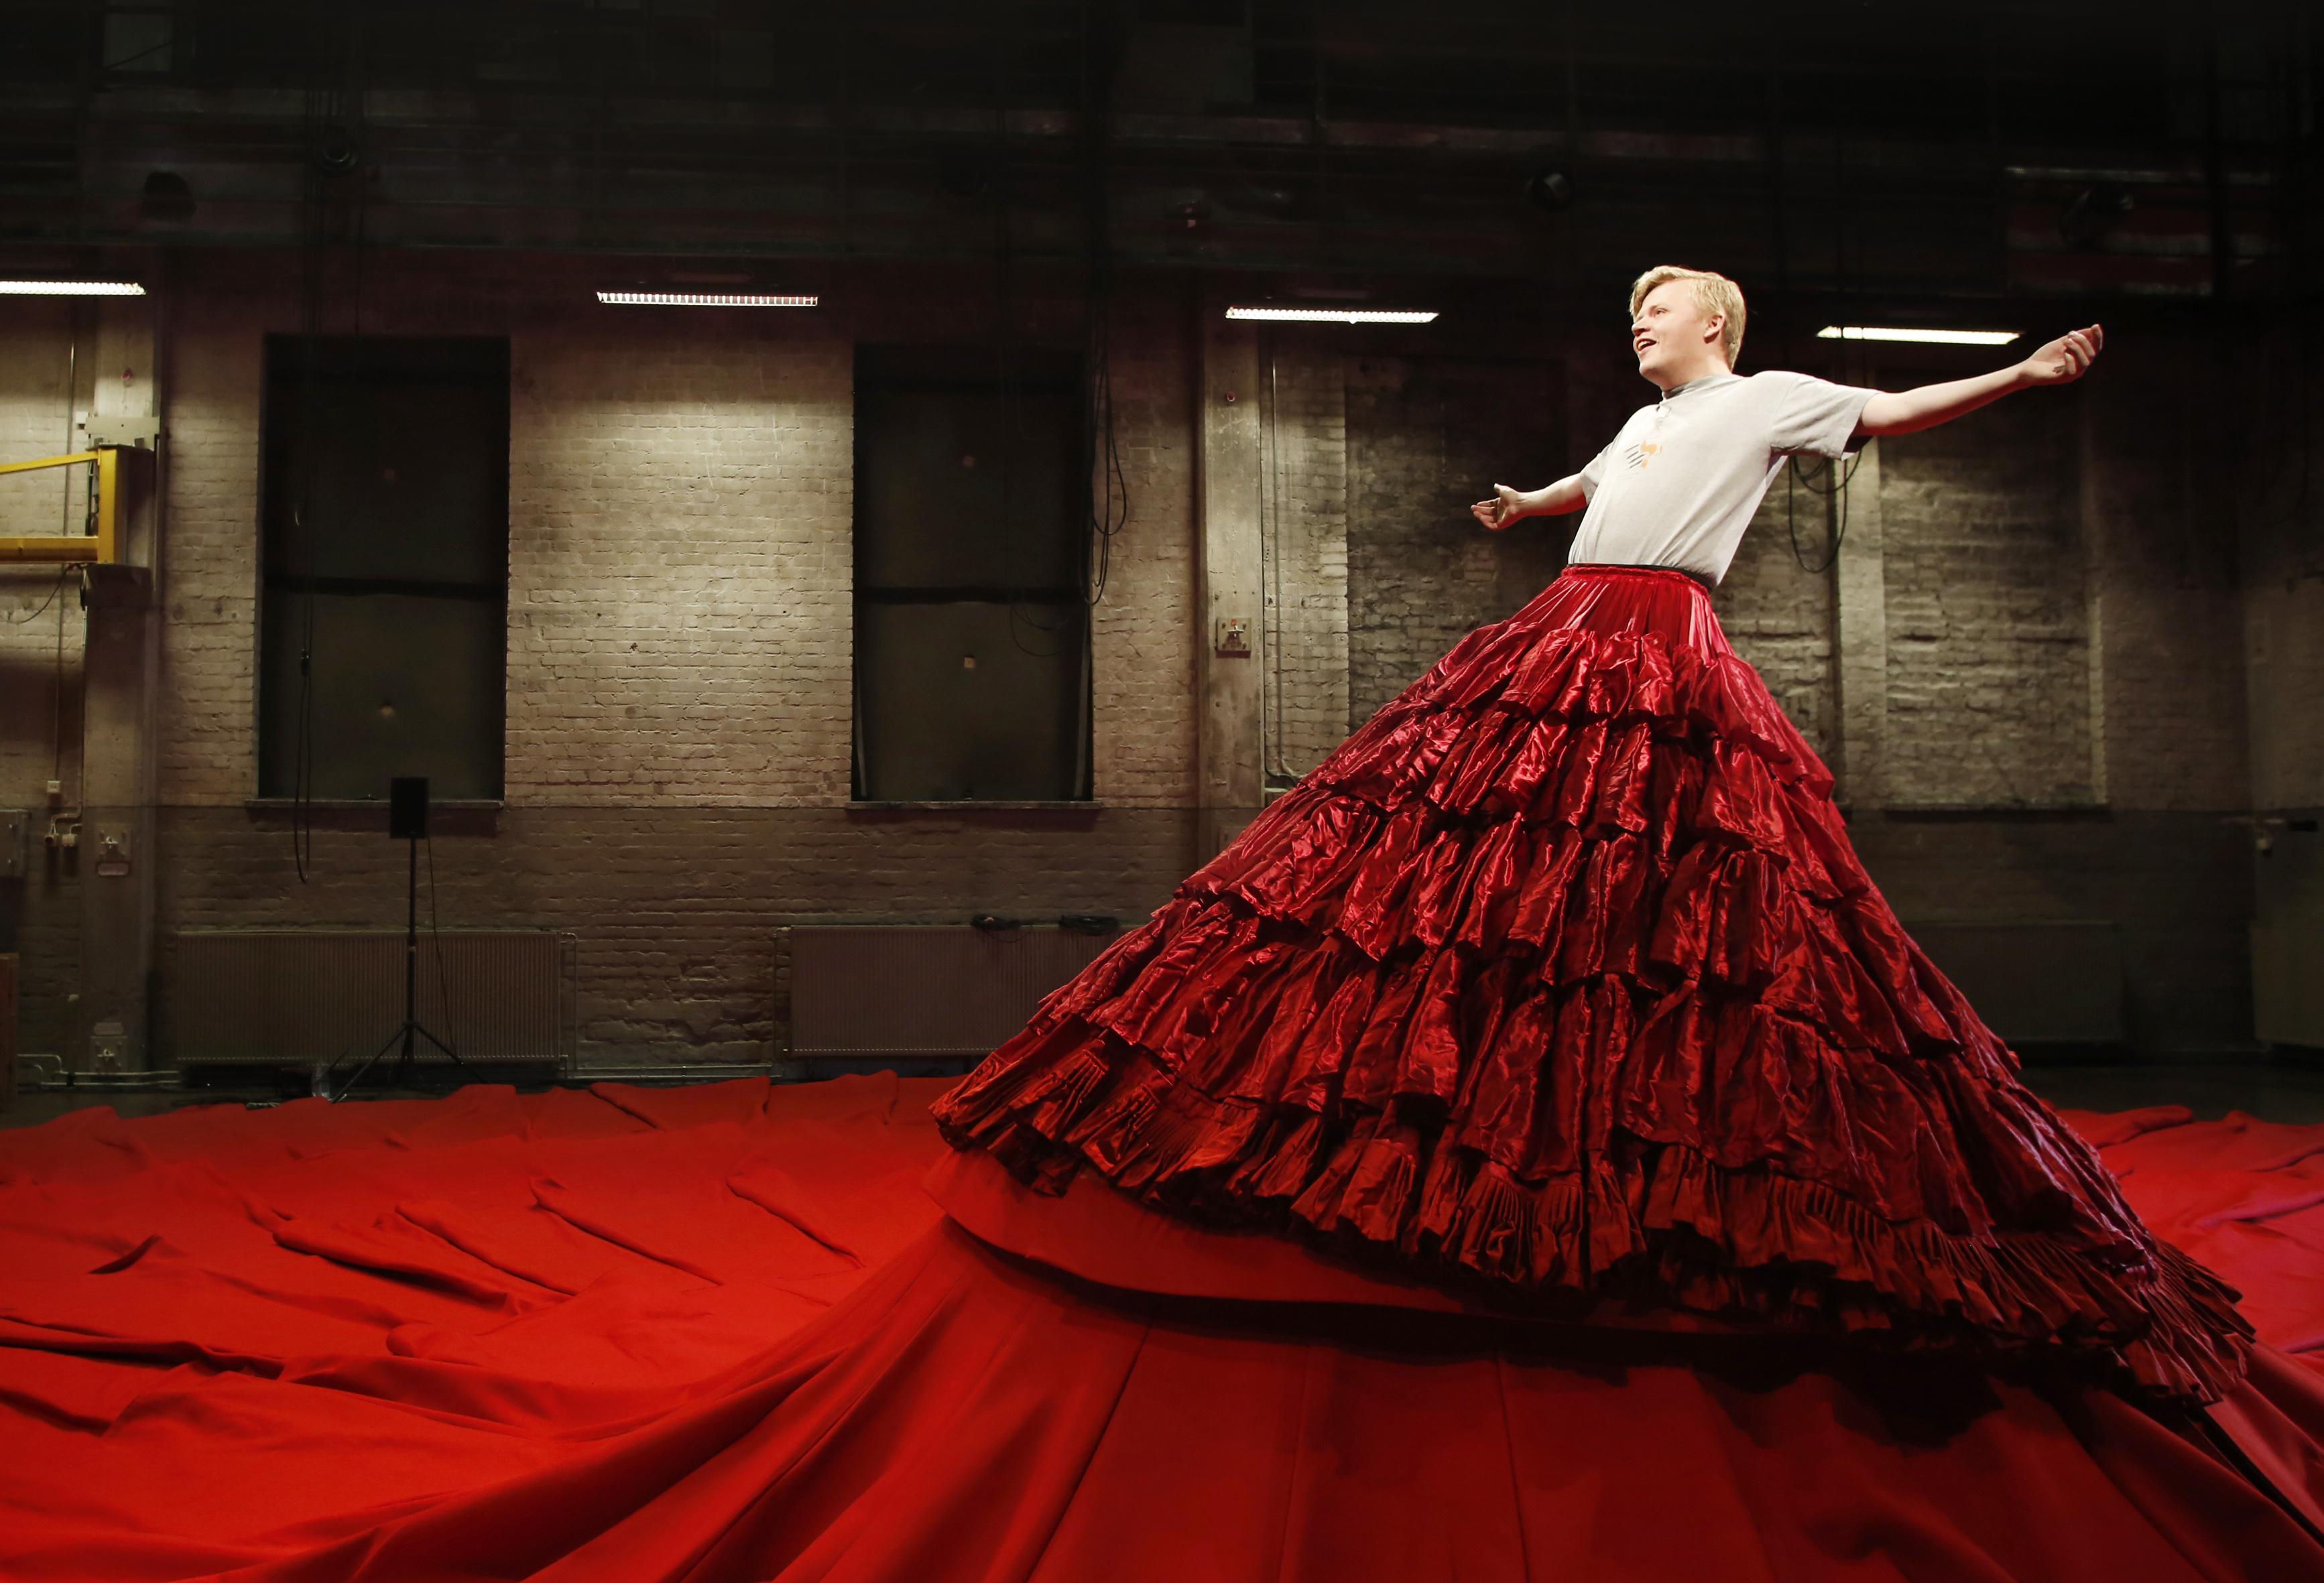 Pekka Kuusisto dressing up in Reddress